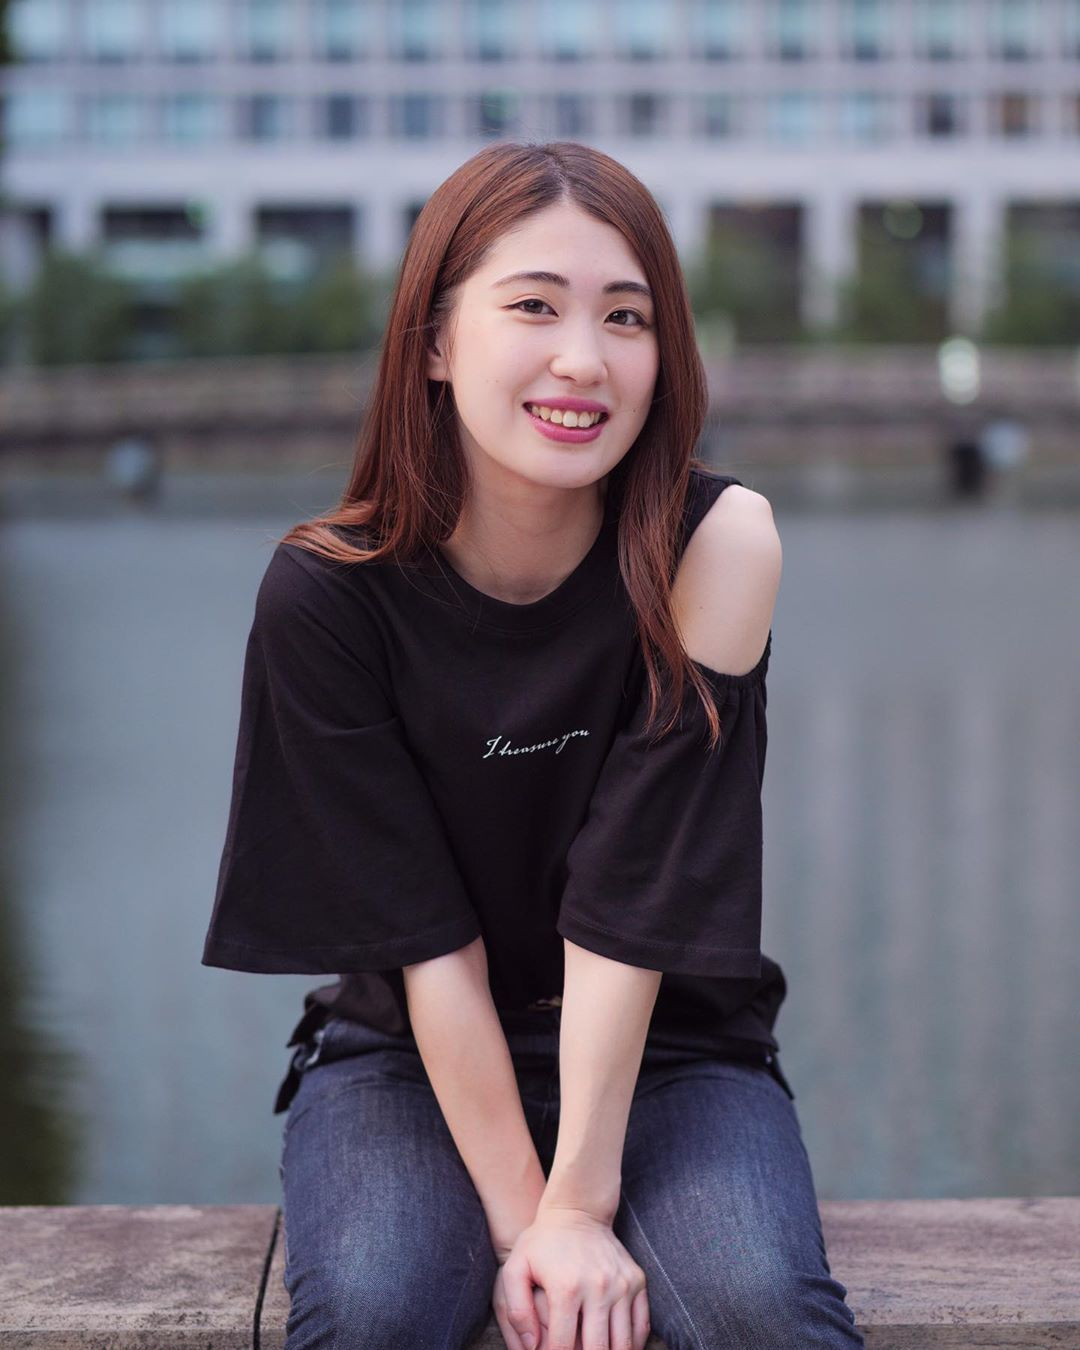 IG内衣老板娘「火辣示范款式」,让人心痒!-新图包